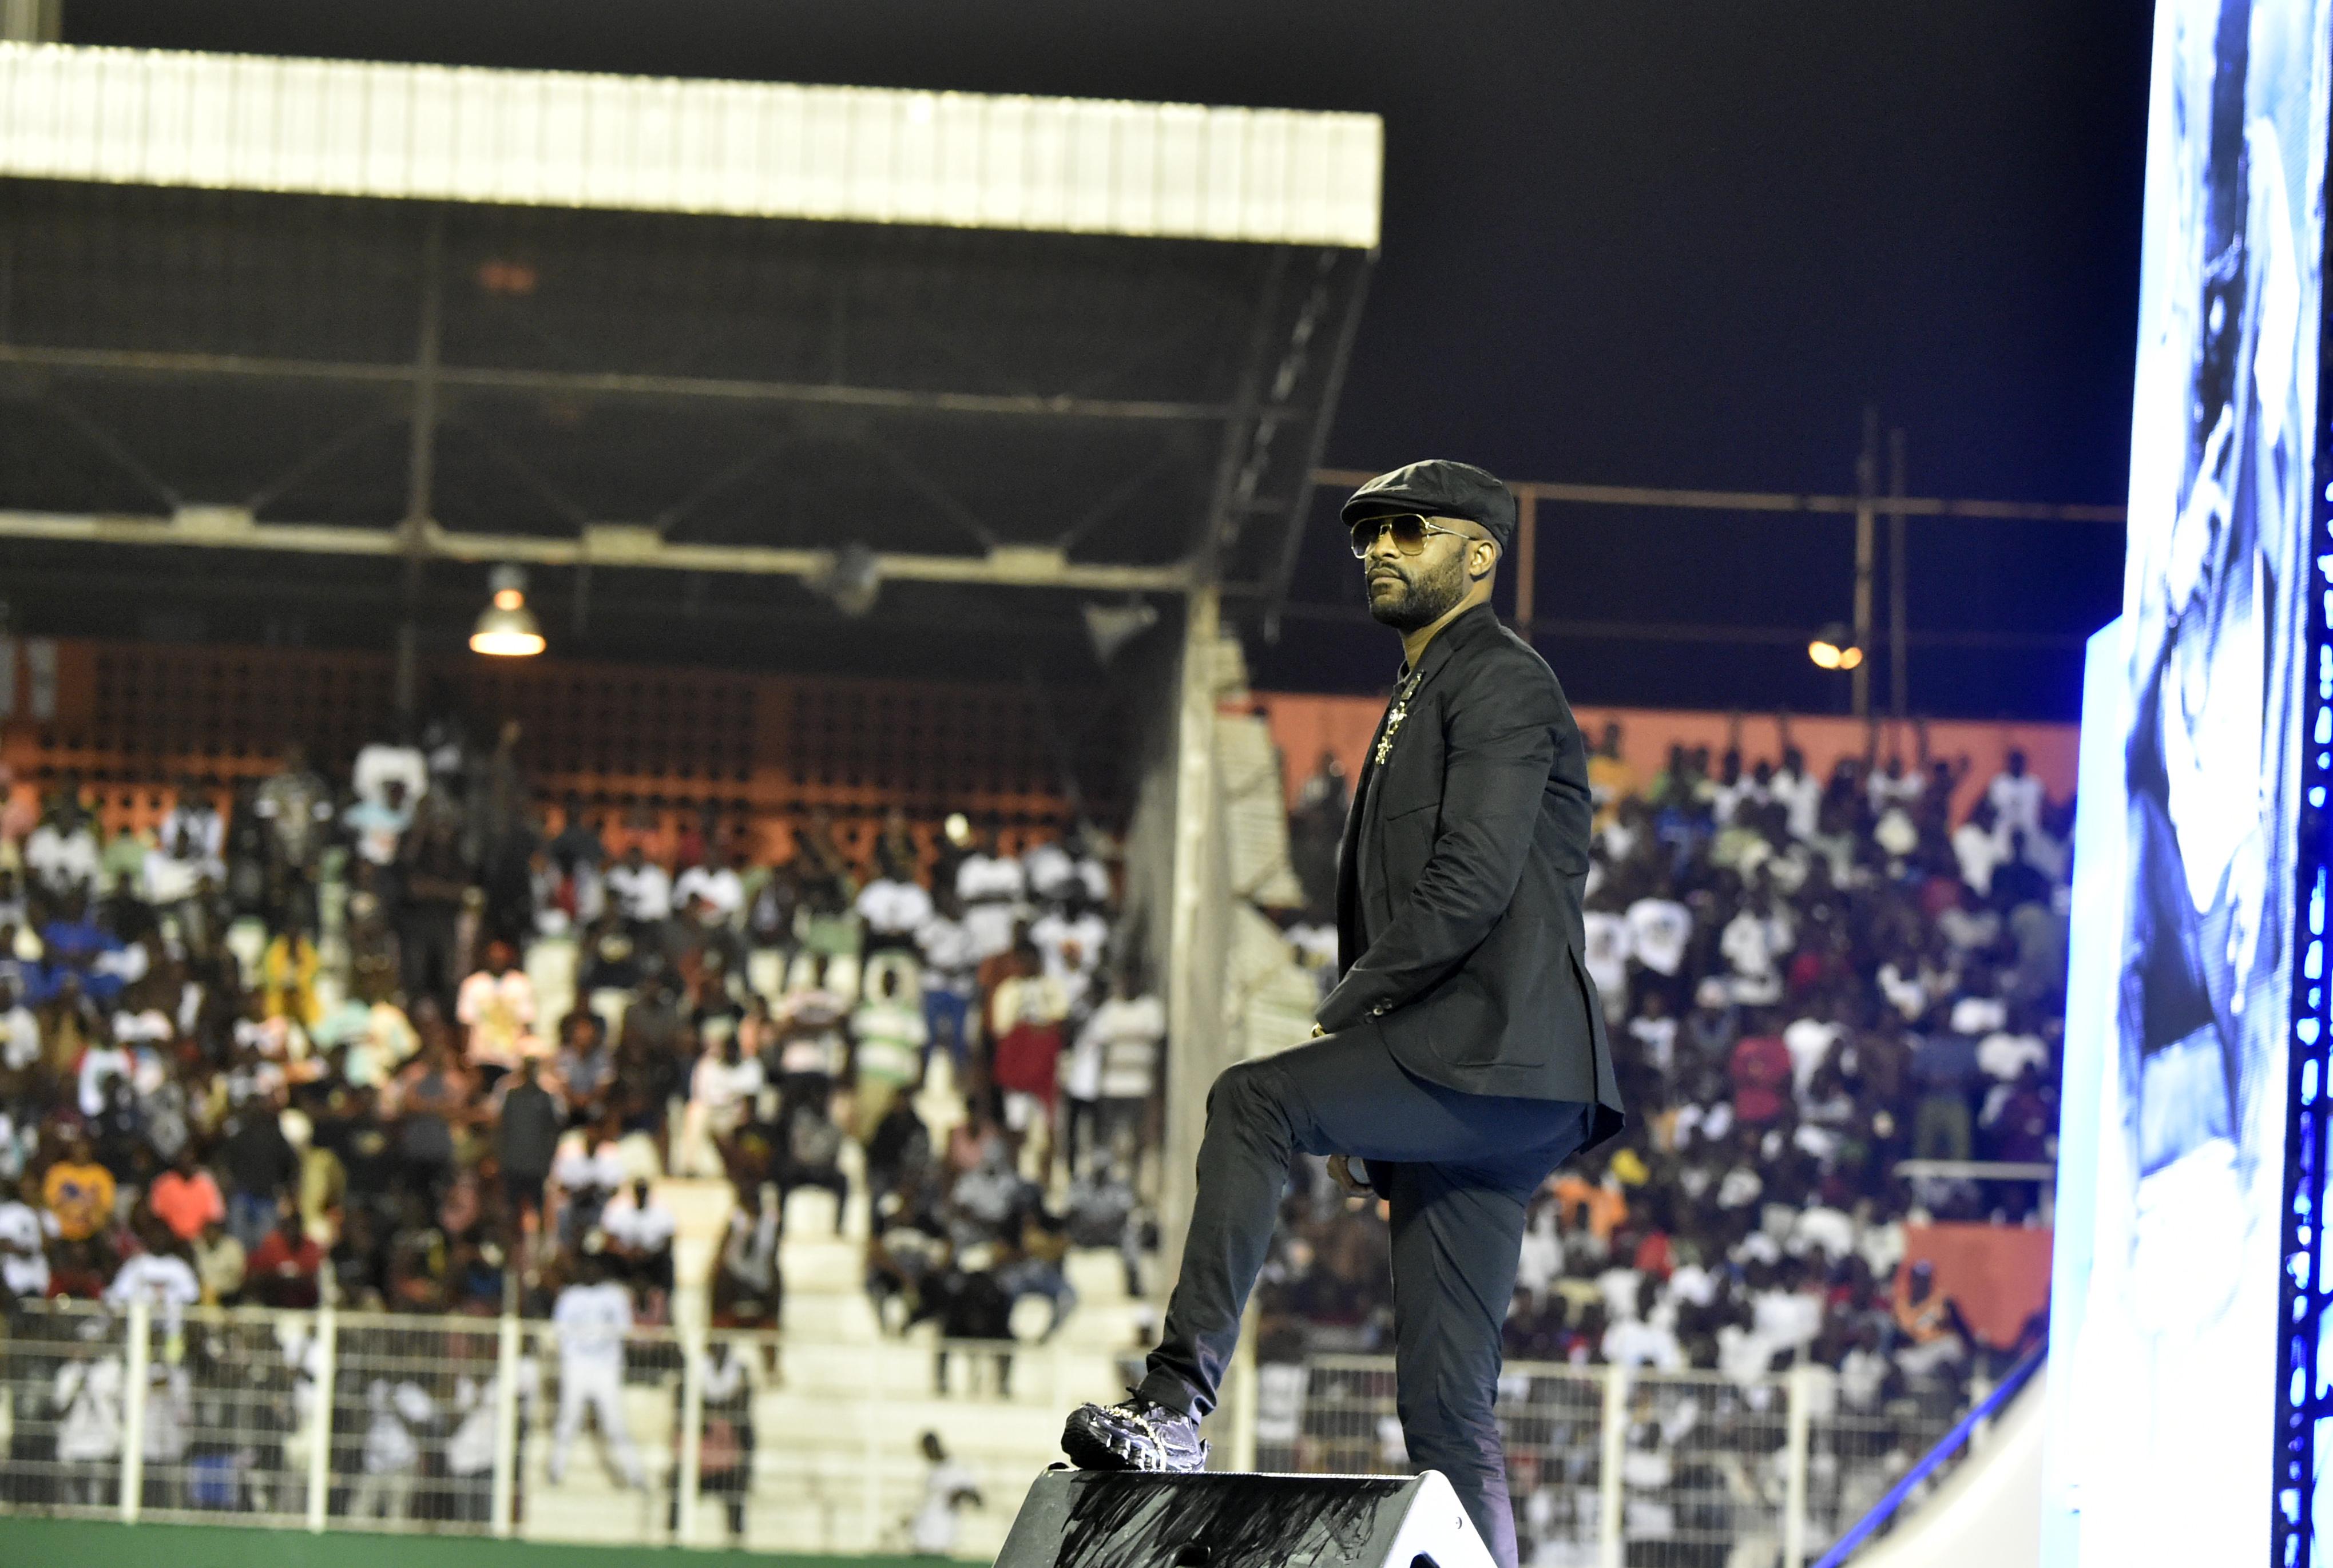 L'artiste Fally Ipupa, le 31 août au stade Félix Houphouët-Boigny, à Abidjan